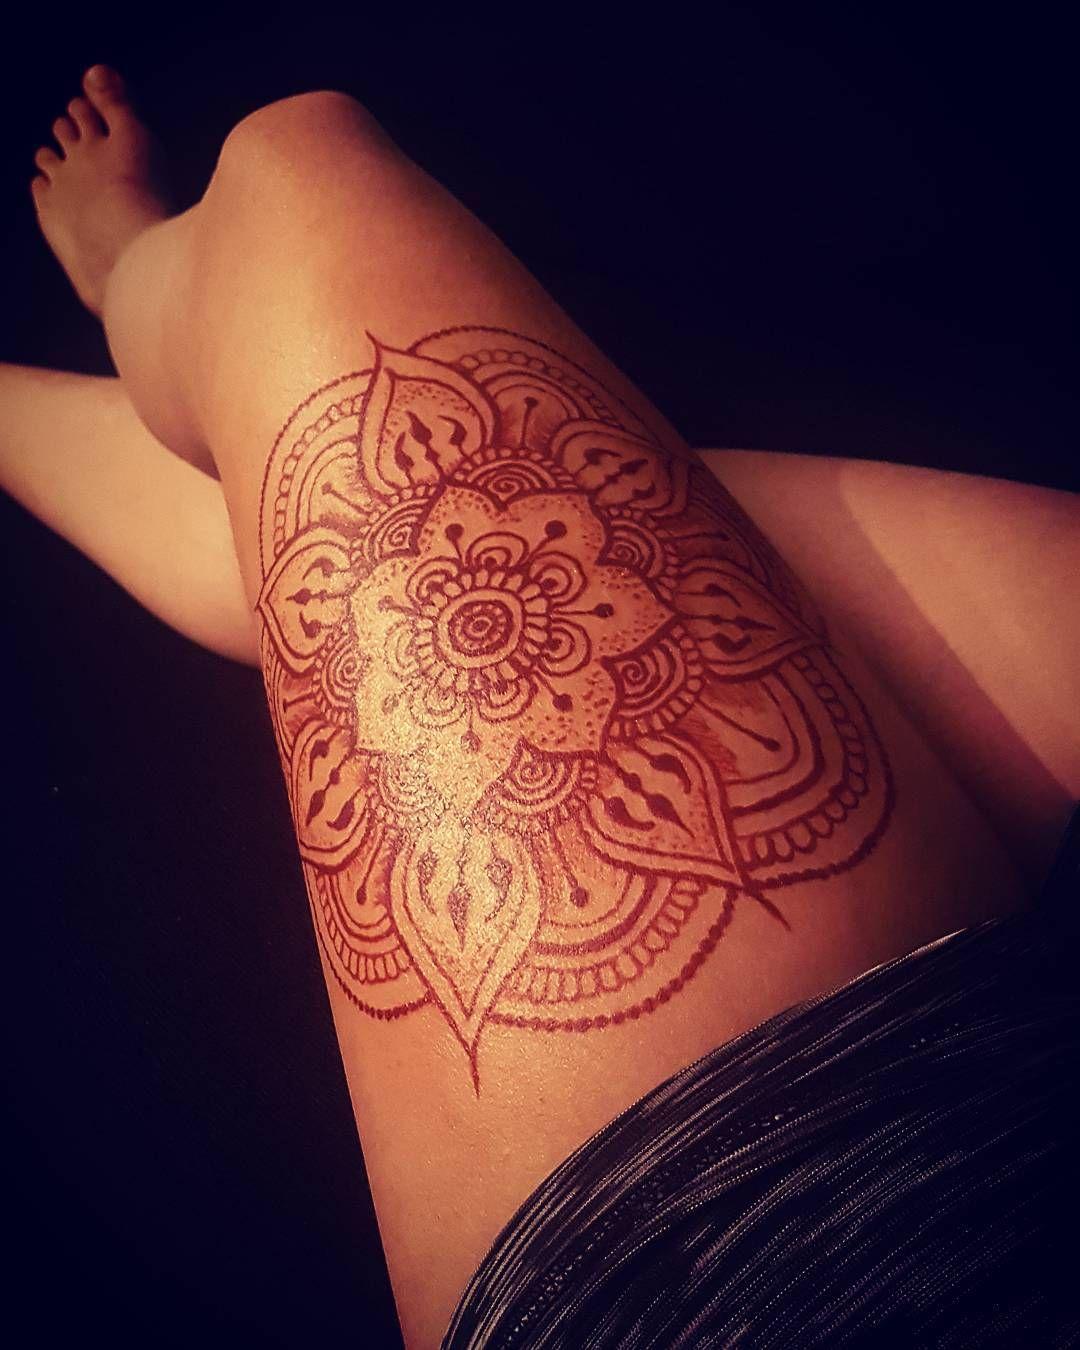 24 Henna Tattoos By Rachel Goldman You Must See: Thigh Henna, Leg Henna, Henna Thigh Tattoo